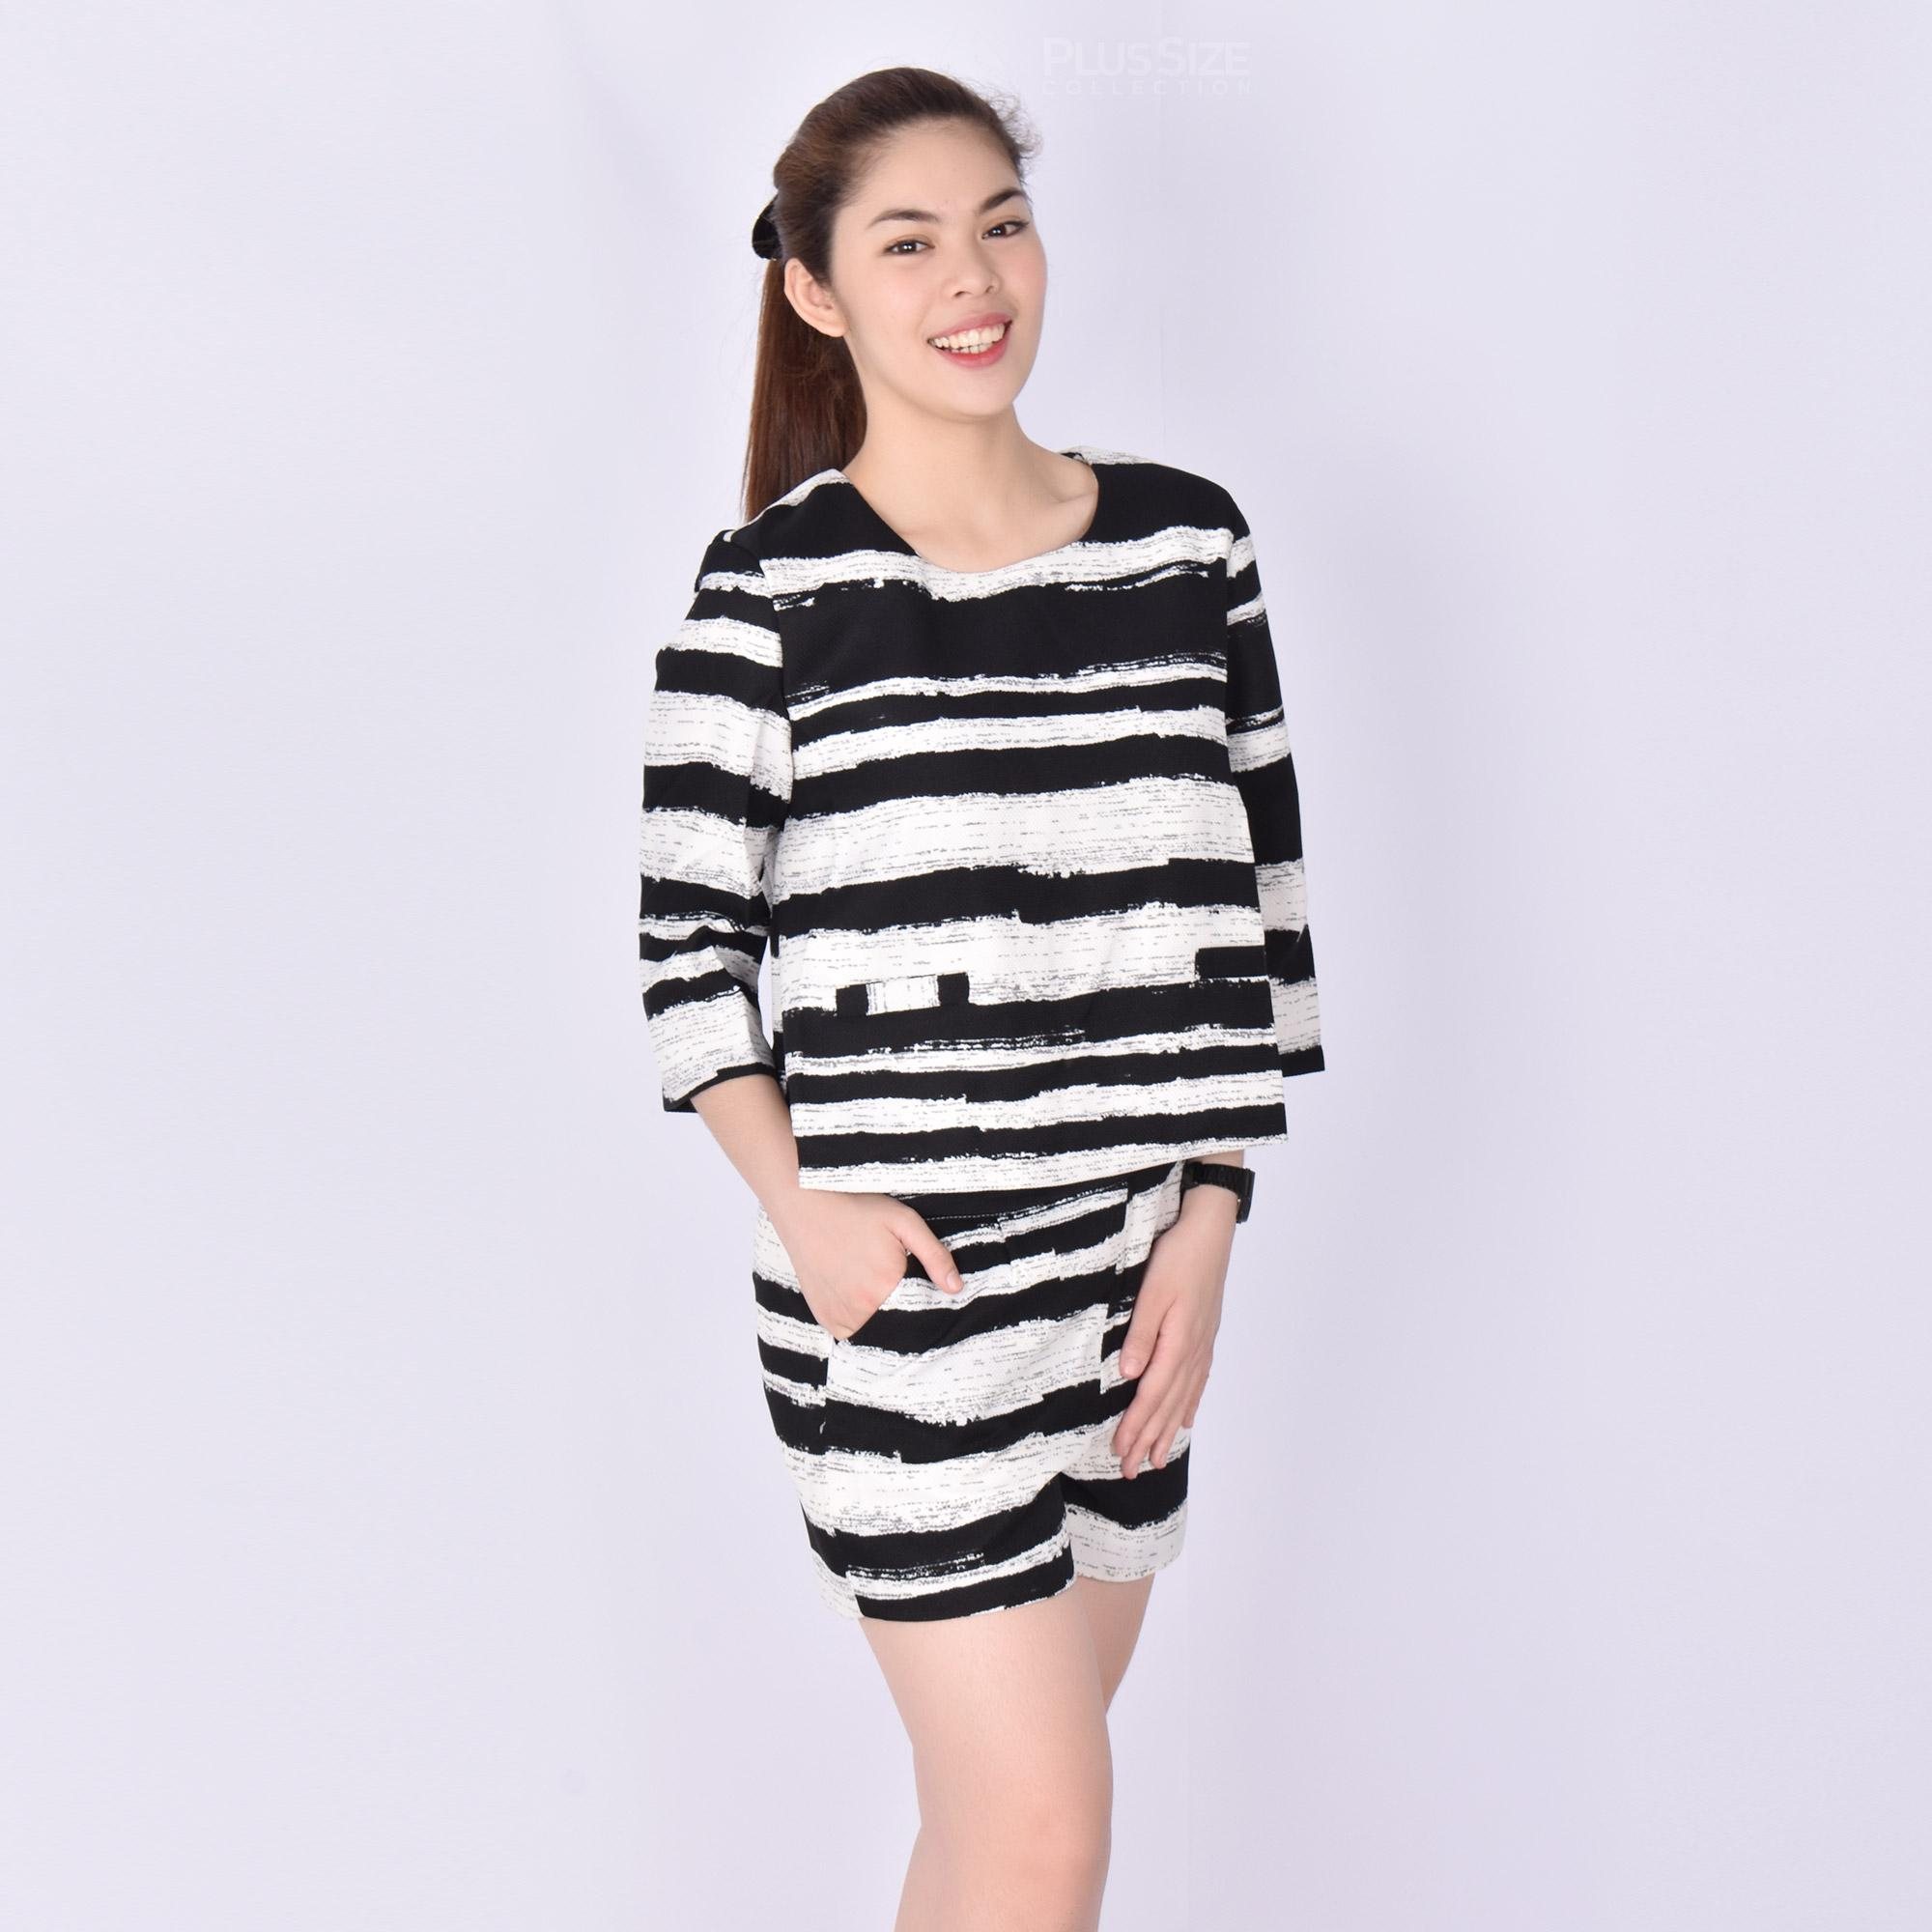 005d6c34d88a4c Korean Stripe Black   White Trendy Fashion Tweed Elegant Terno Blouse    Short 3 4